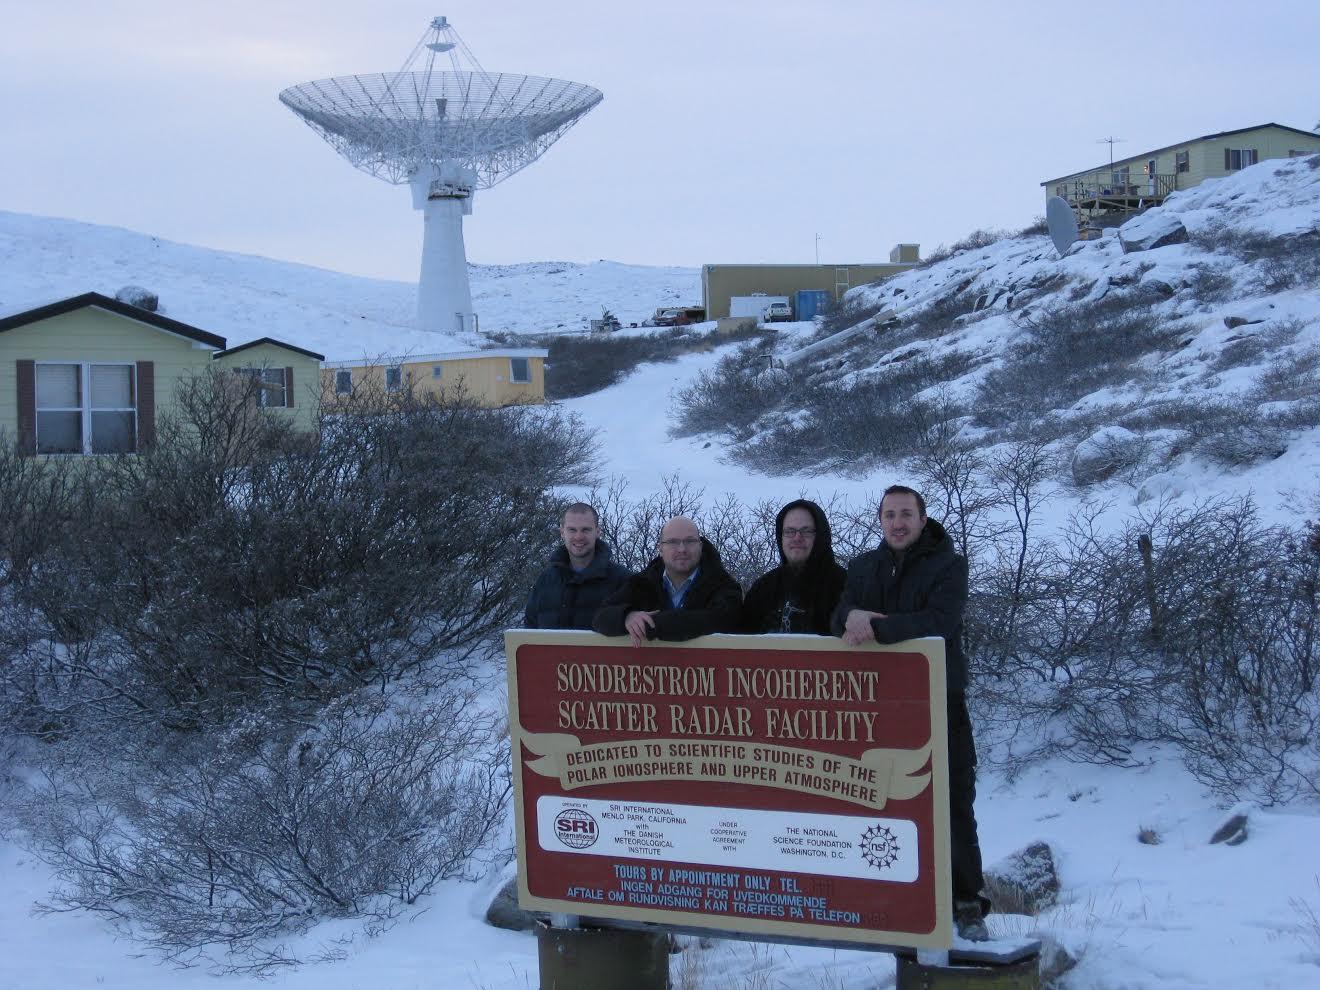 Sondrestrom staff standing before Sondrestrom radar dish in background.